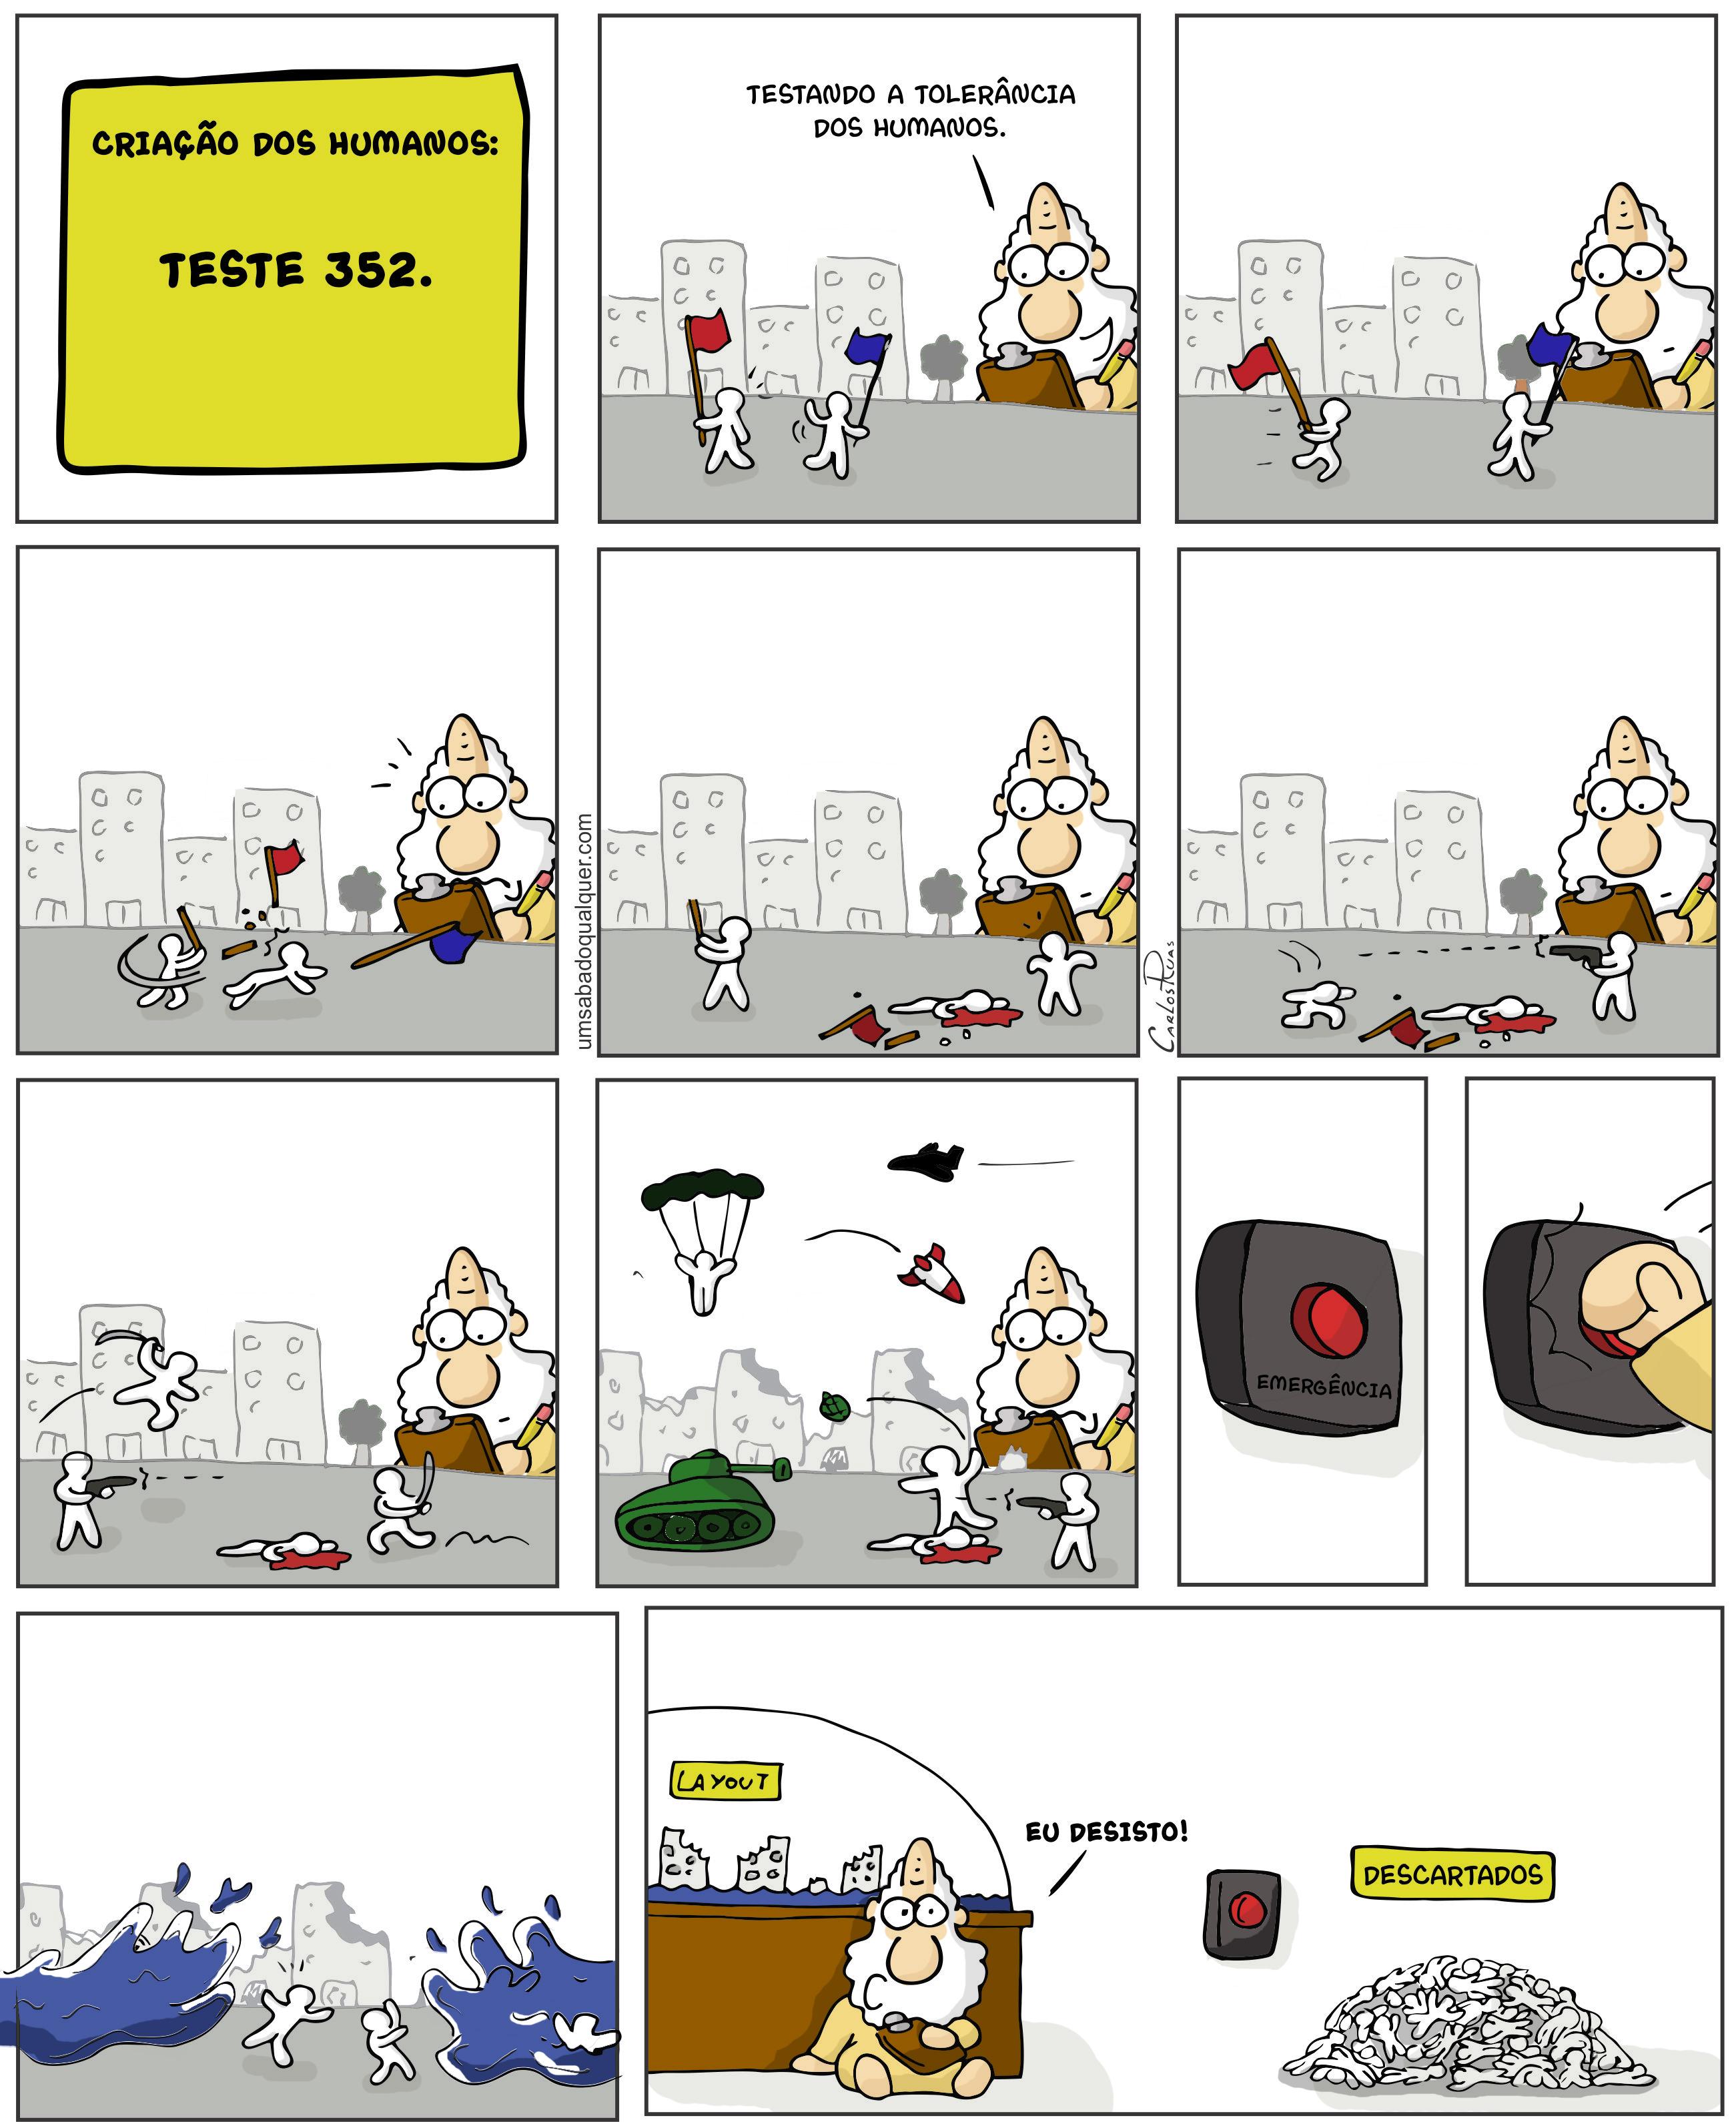 1393 – Testes 3